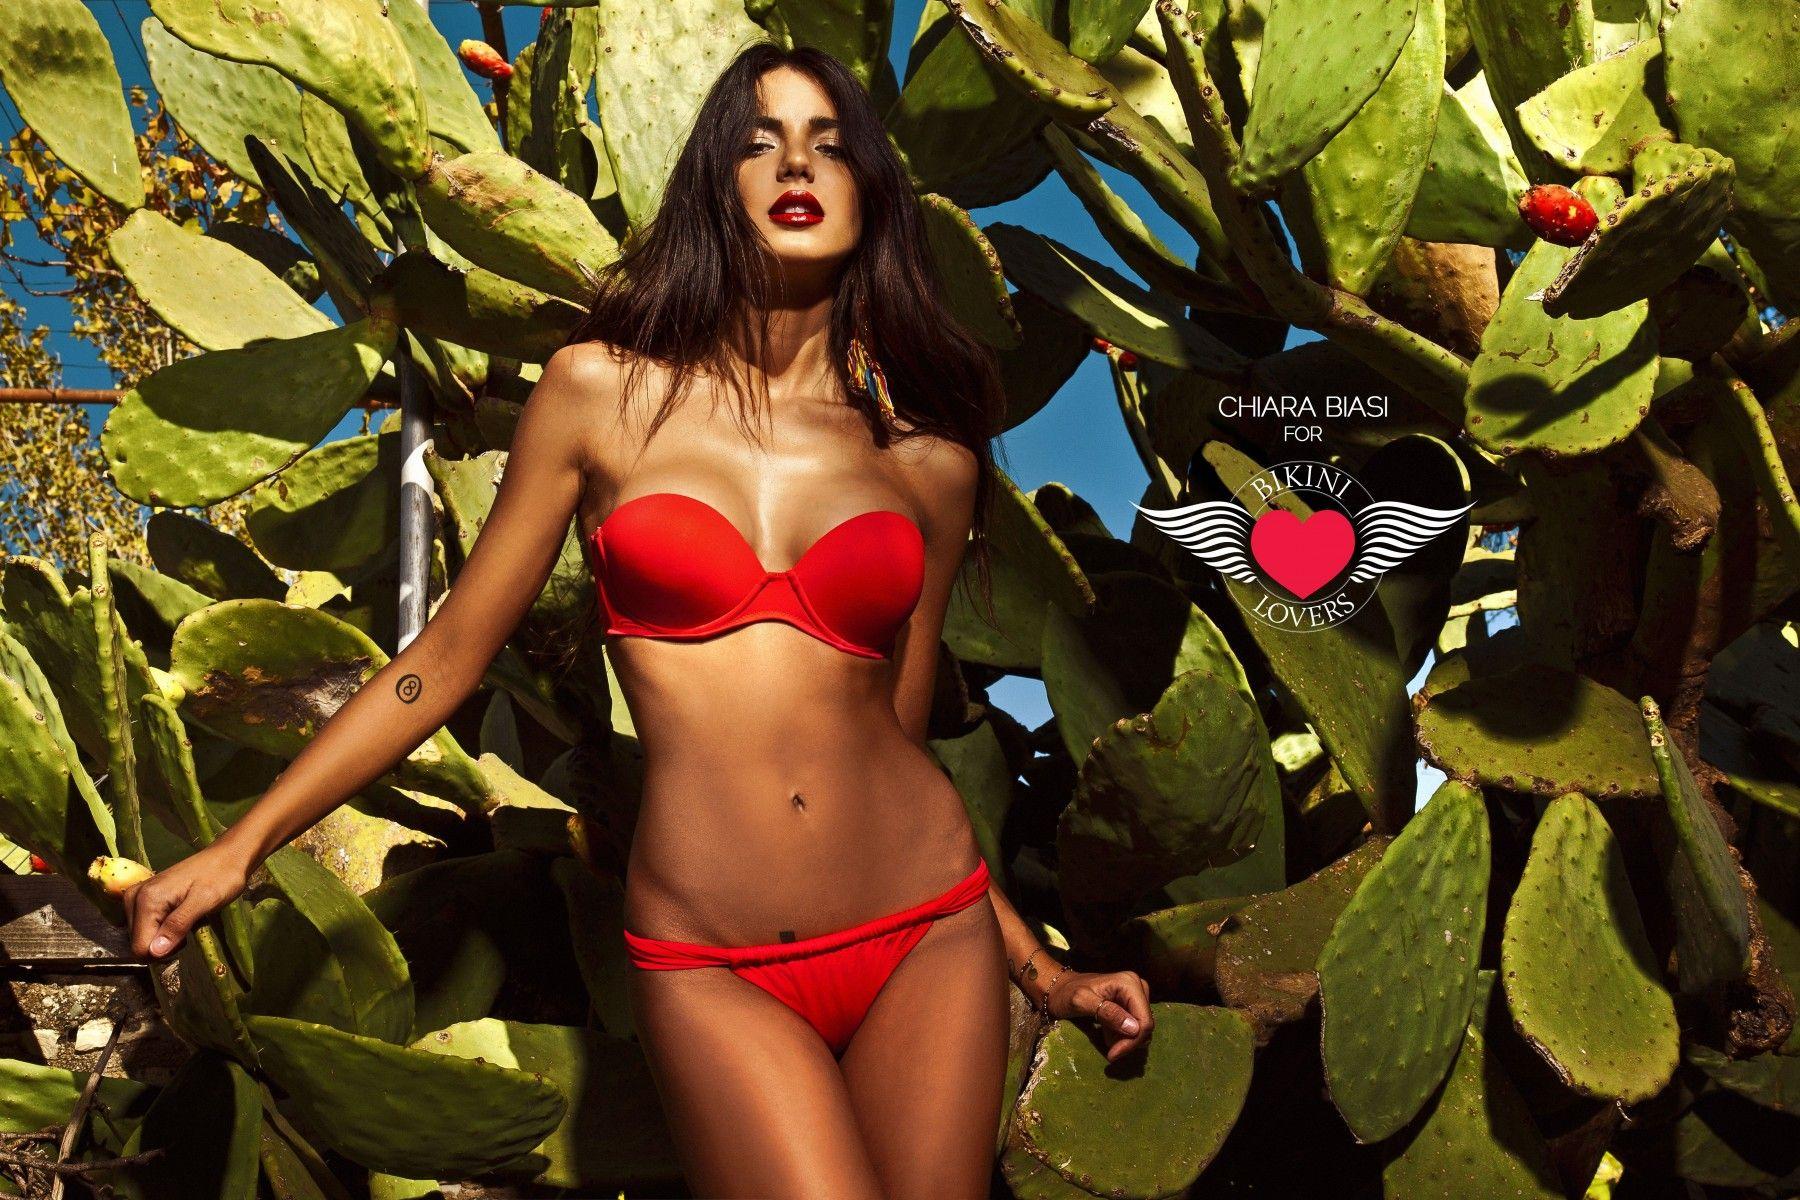 2a0c8cab01 Chiara Biasi bikini lovers   Other   Fashion Ad Campaigns and ...